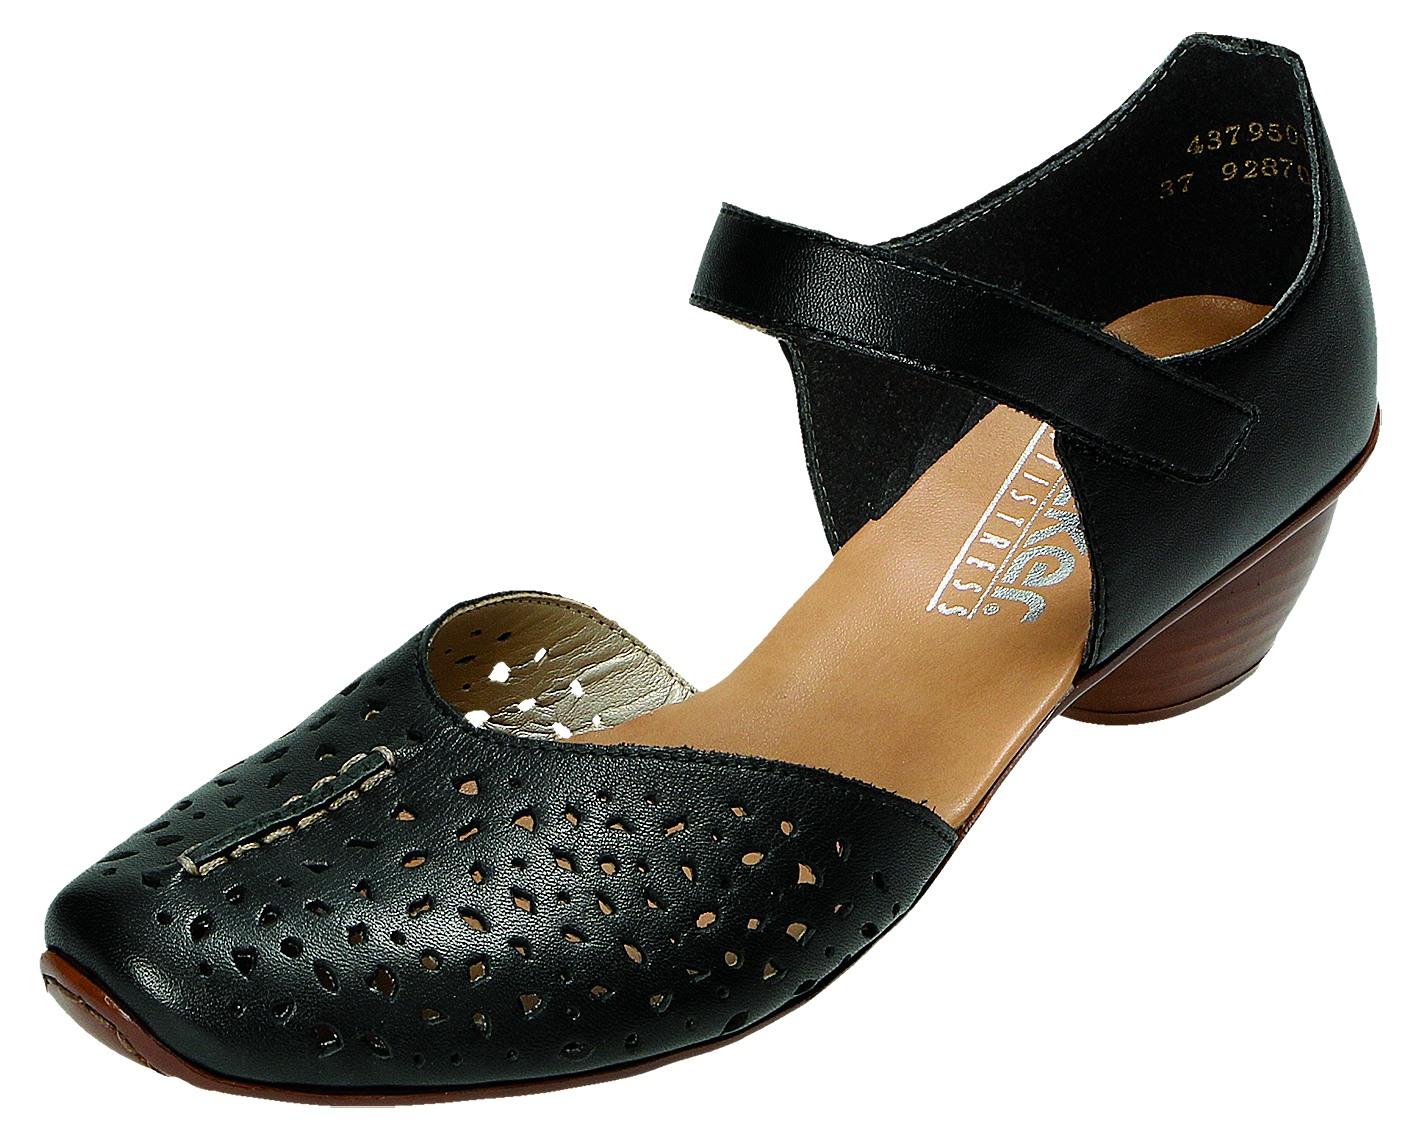 Details zu Rieker Damen Schuhe sportlich Damen Pumps Schwarz 43795 01 SCHWAR